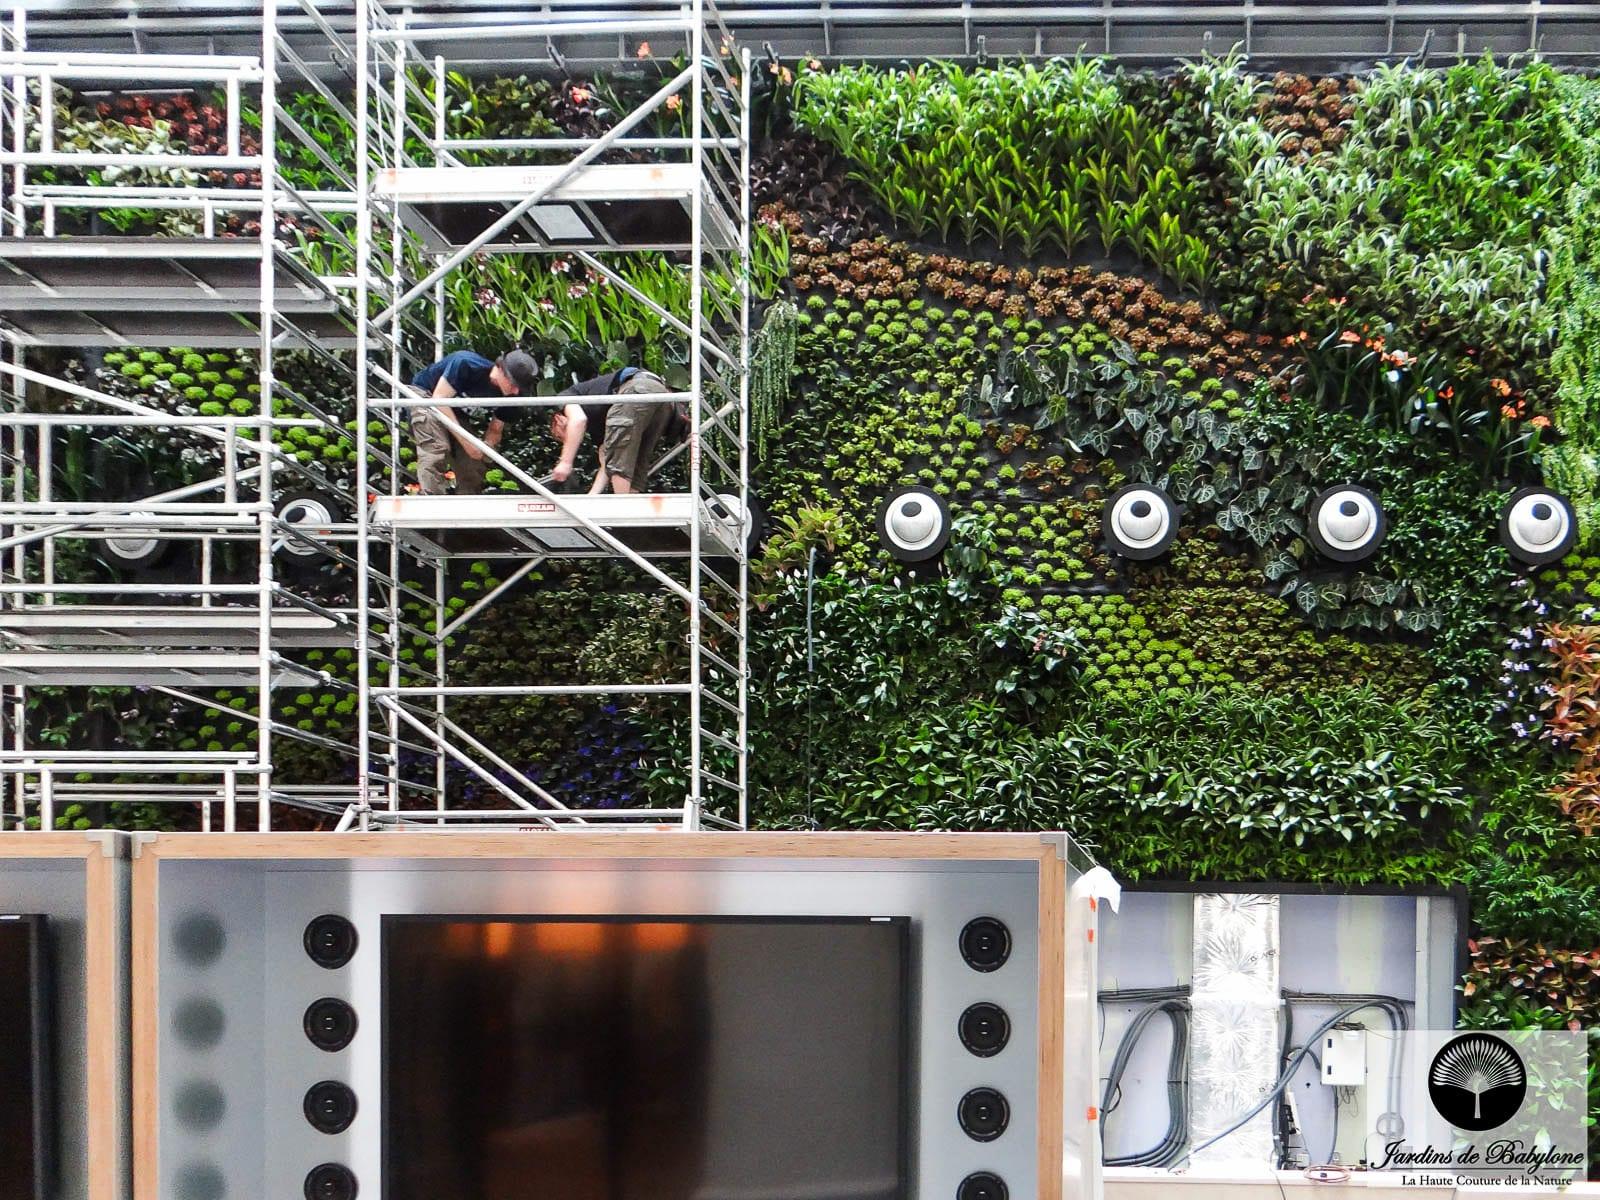 Green Wall Construction At Jardins De Babylone: Living Walls ... avec Geotextile Jardin